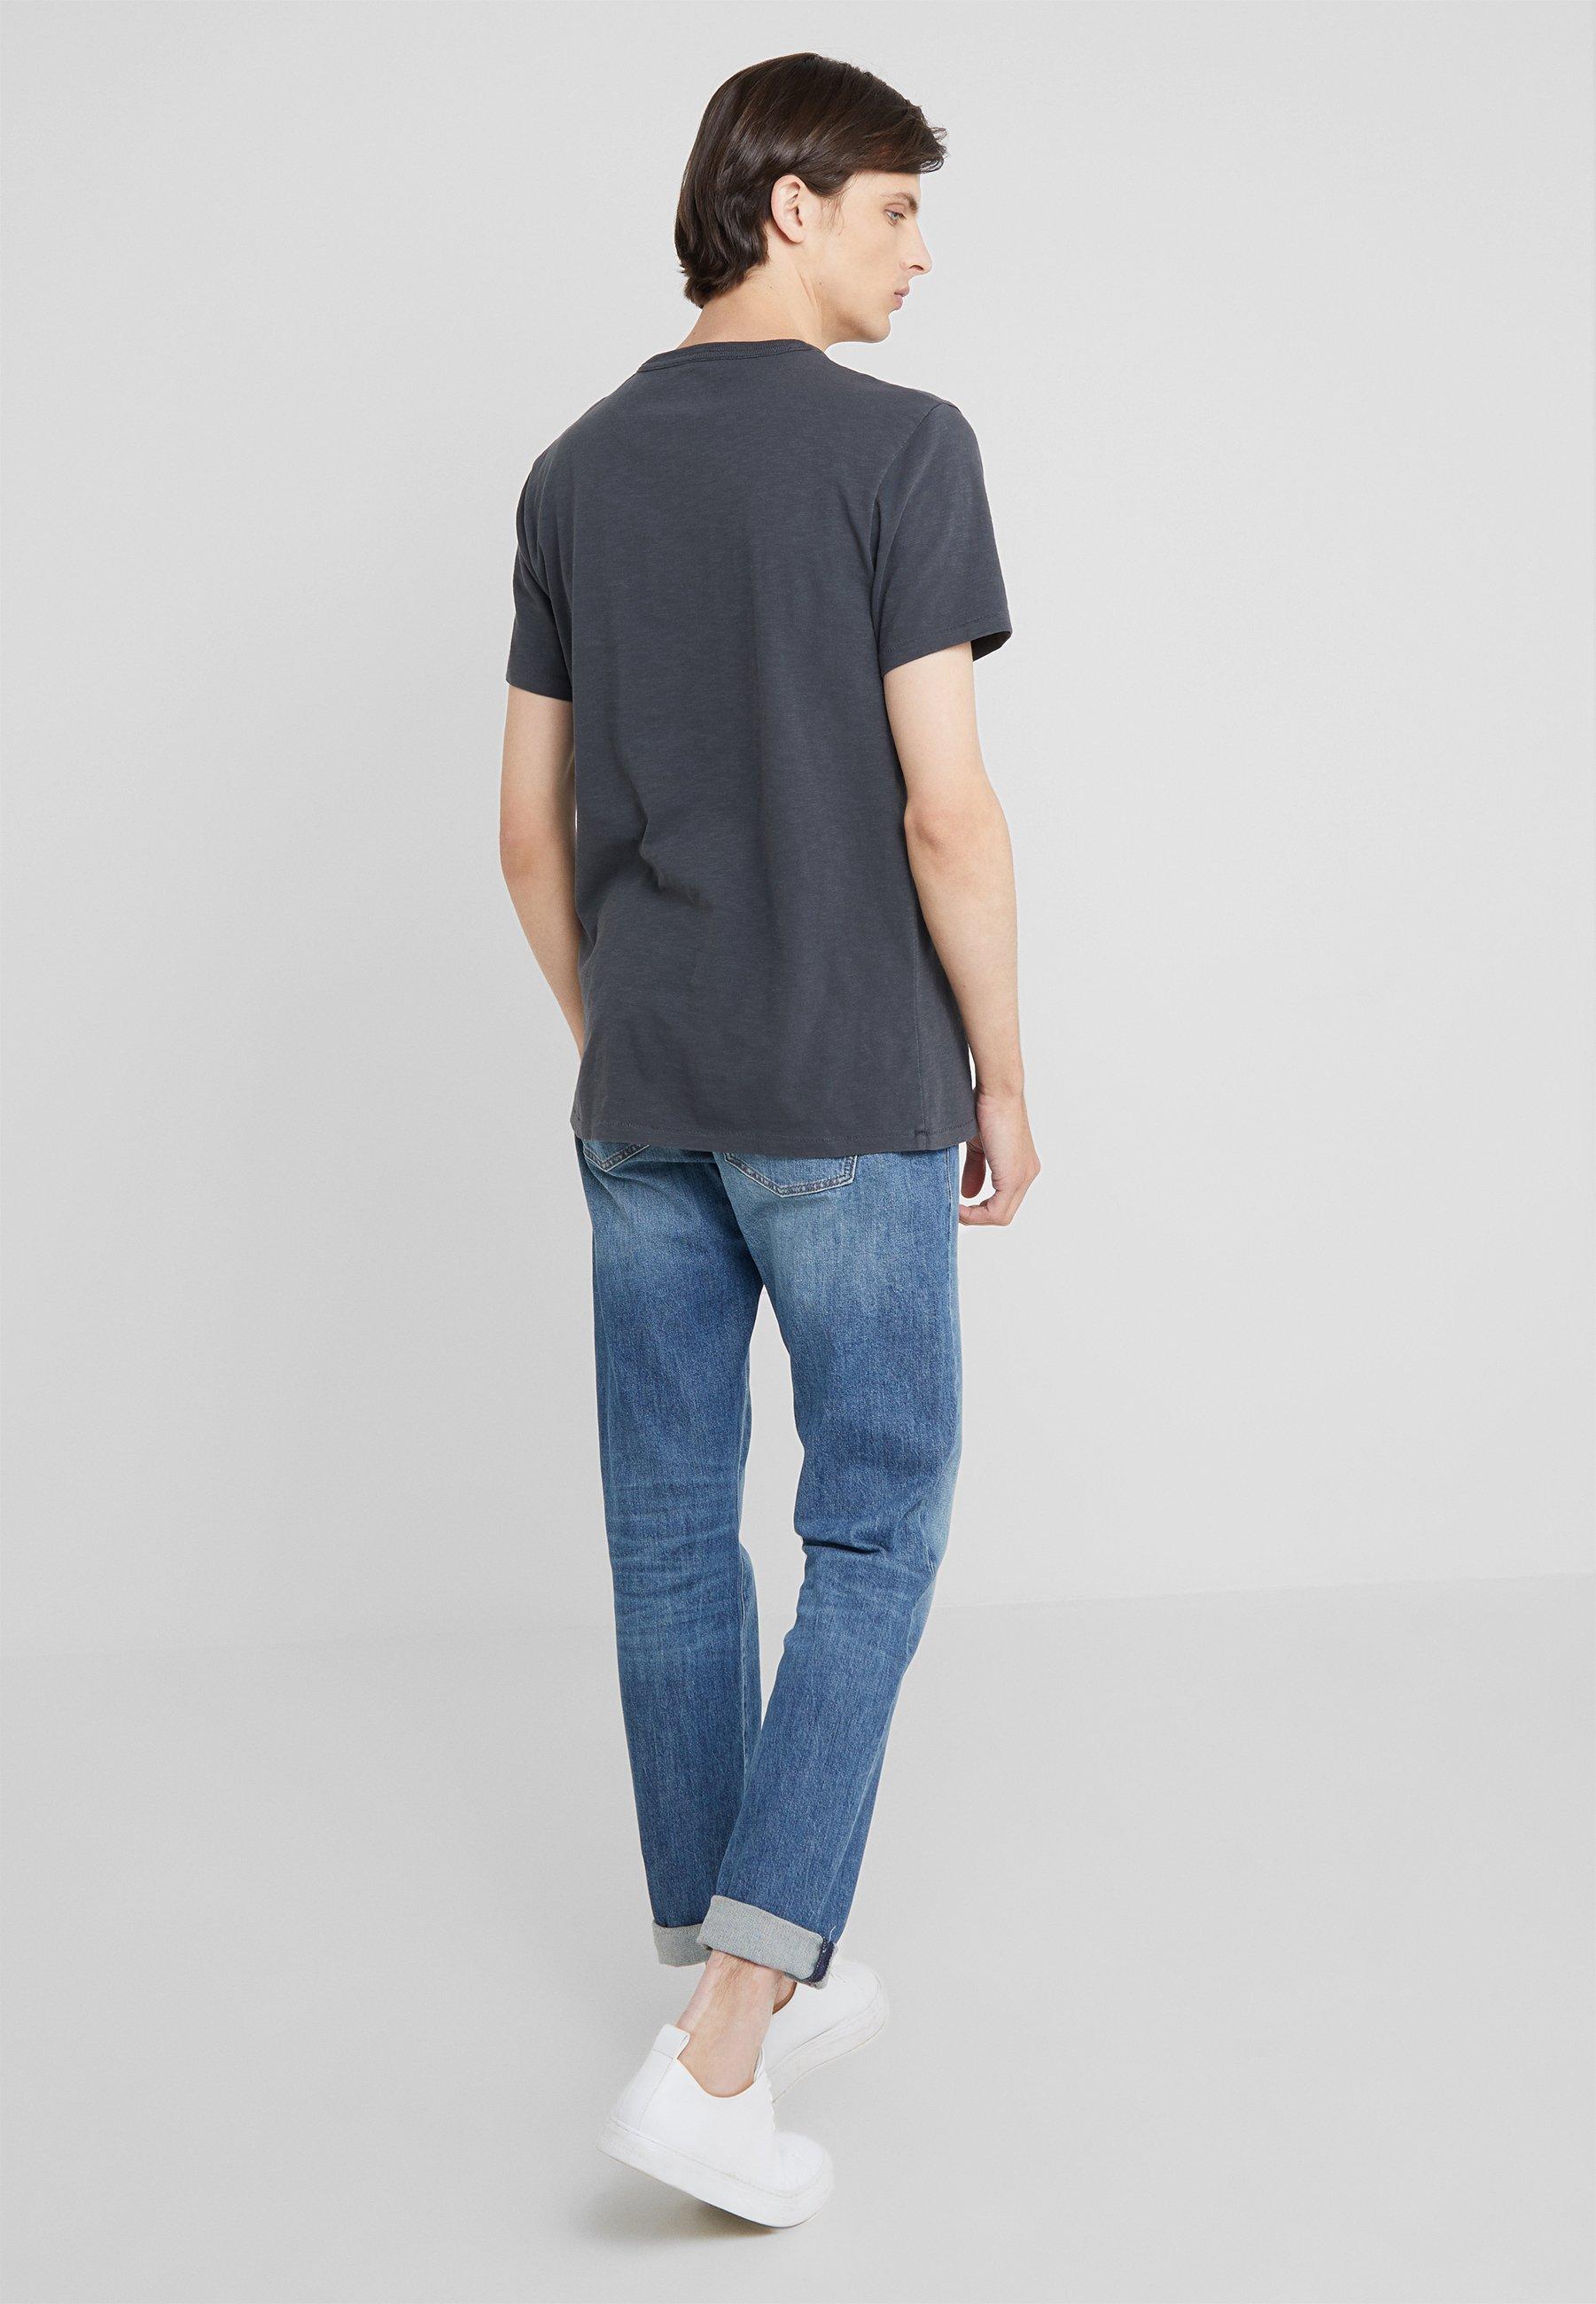 Dye Basique Garment CrewT crew Pocket Black J shirt 8nk0OwP